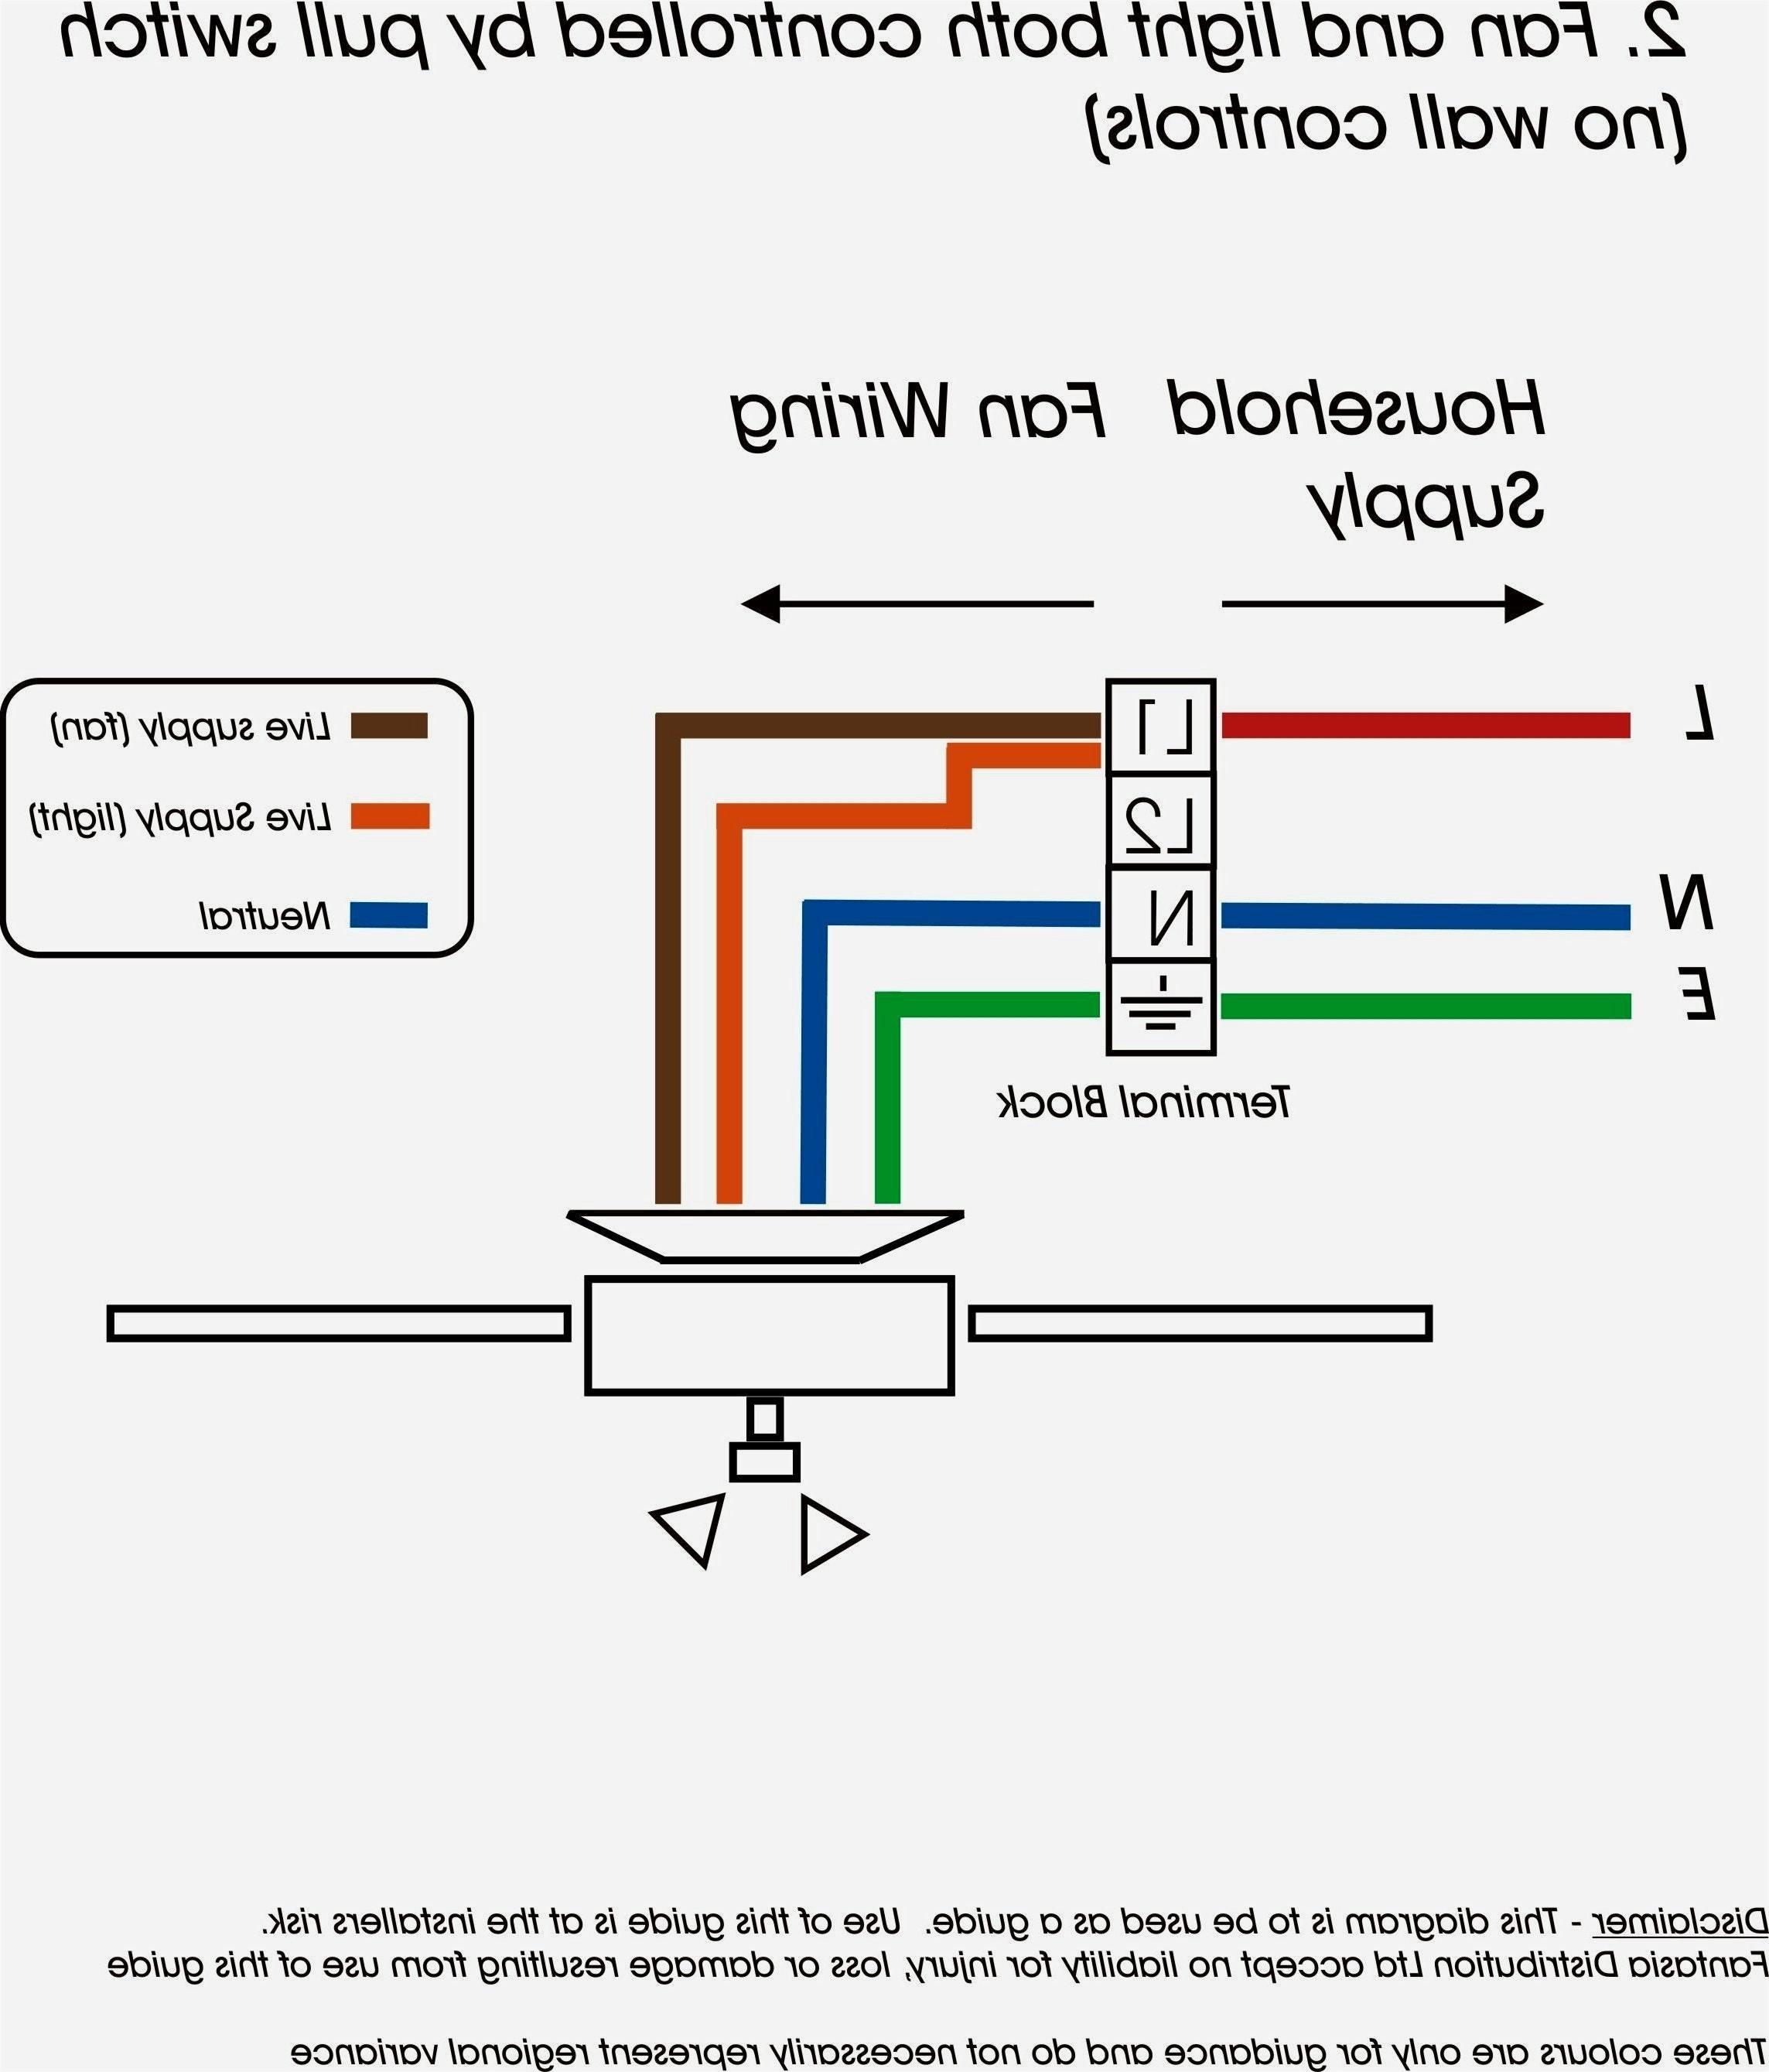 texas pride trailer wiring diagram Collection-Mitsubishi Trailer Wiring Diagram Best Eacad Wiring Diagram and 40 Fantastic Texas Pride Trailer Wiring 8-b